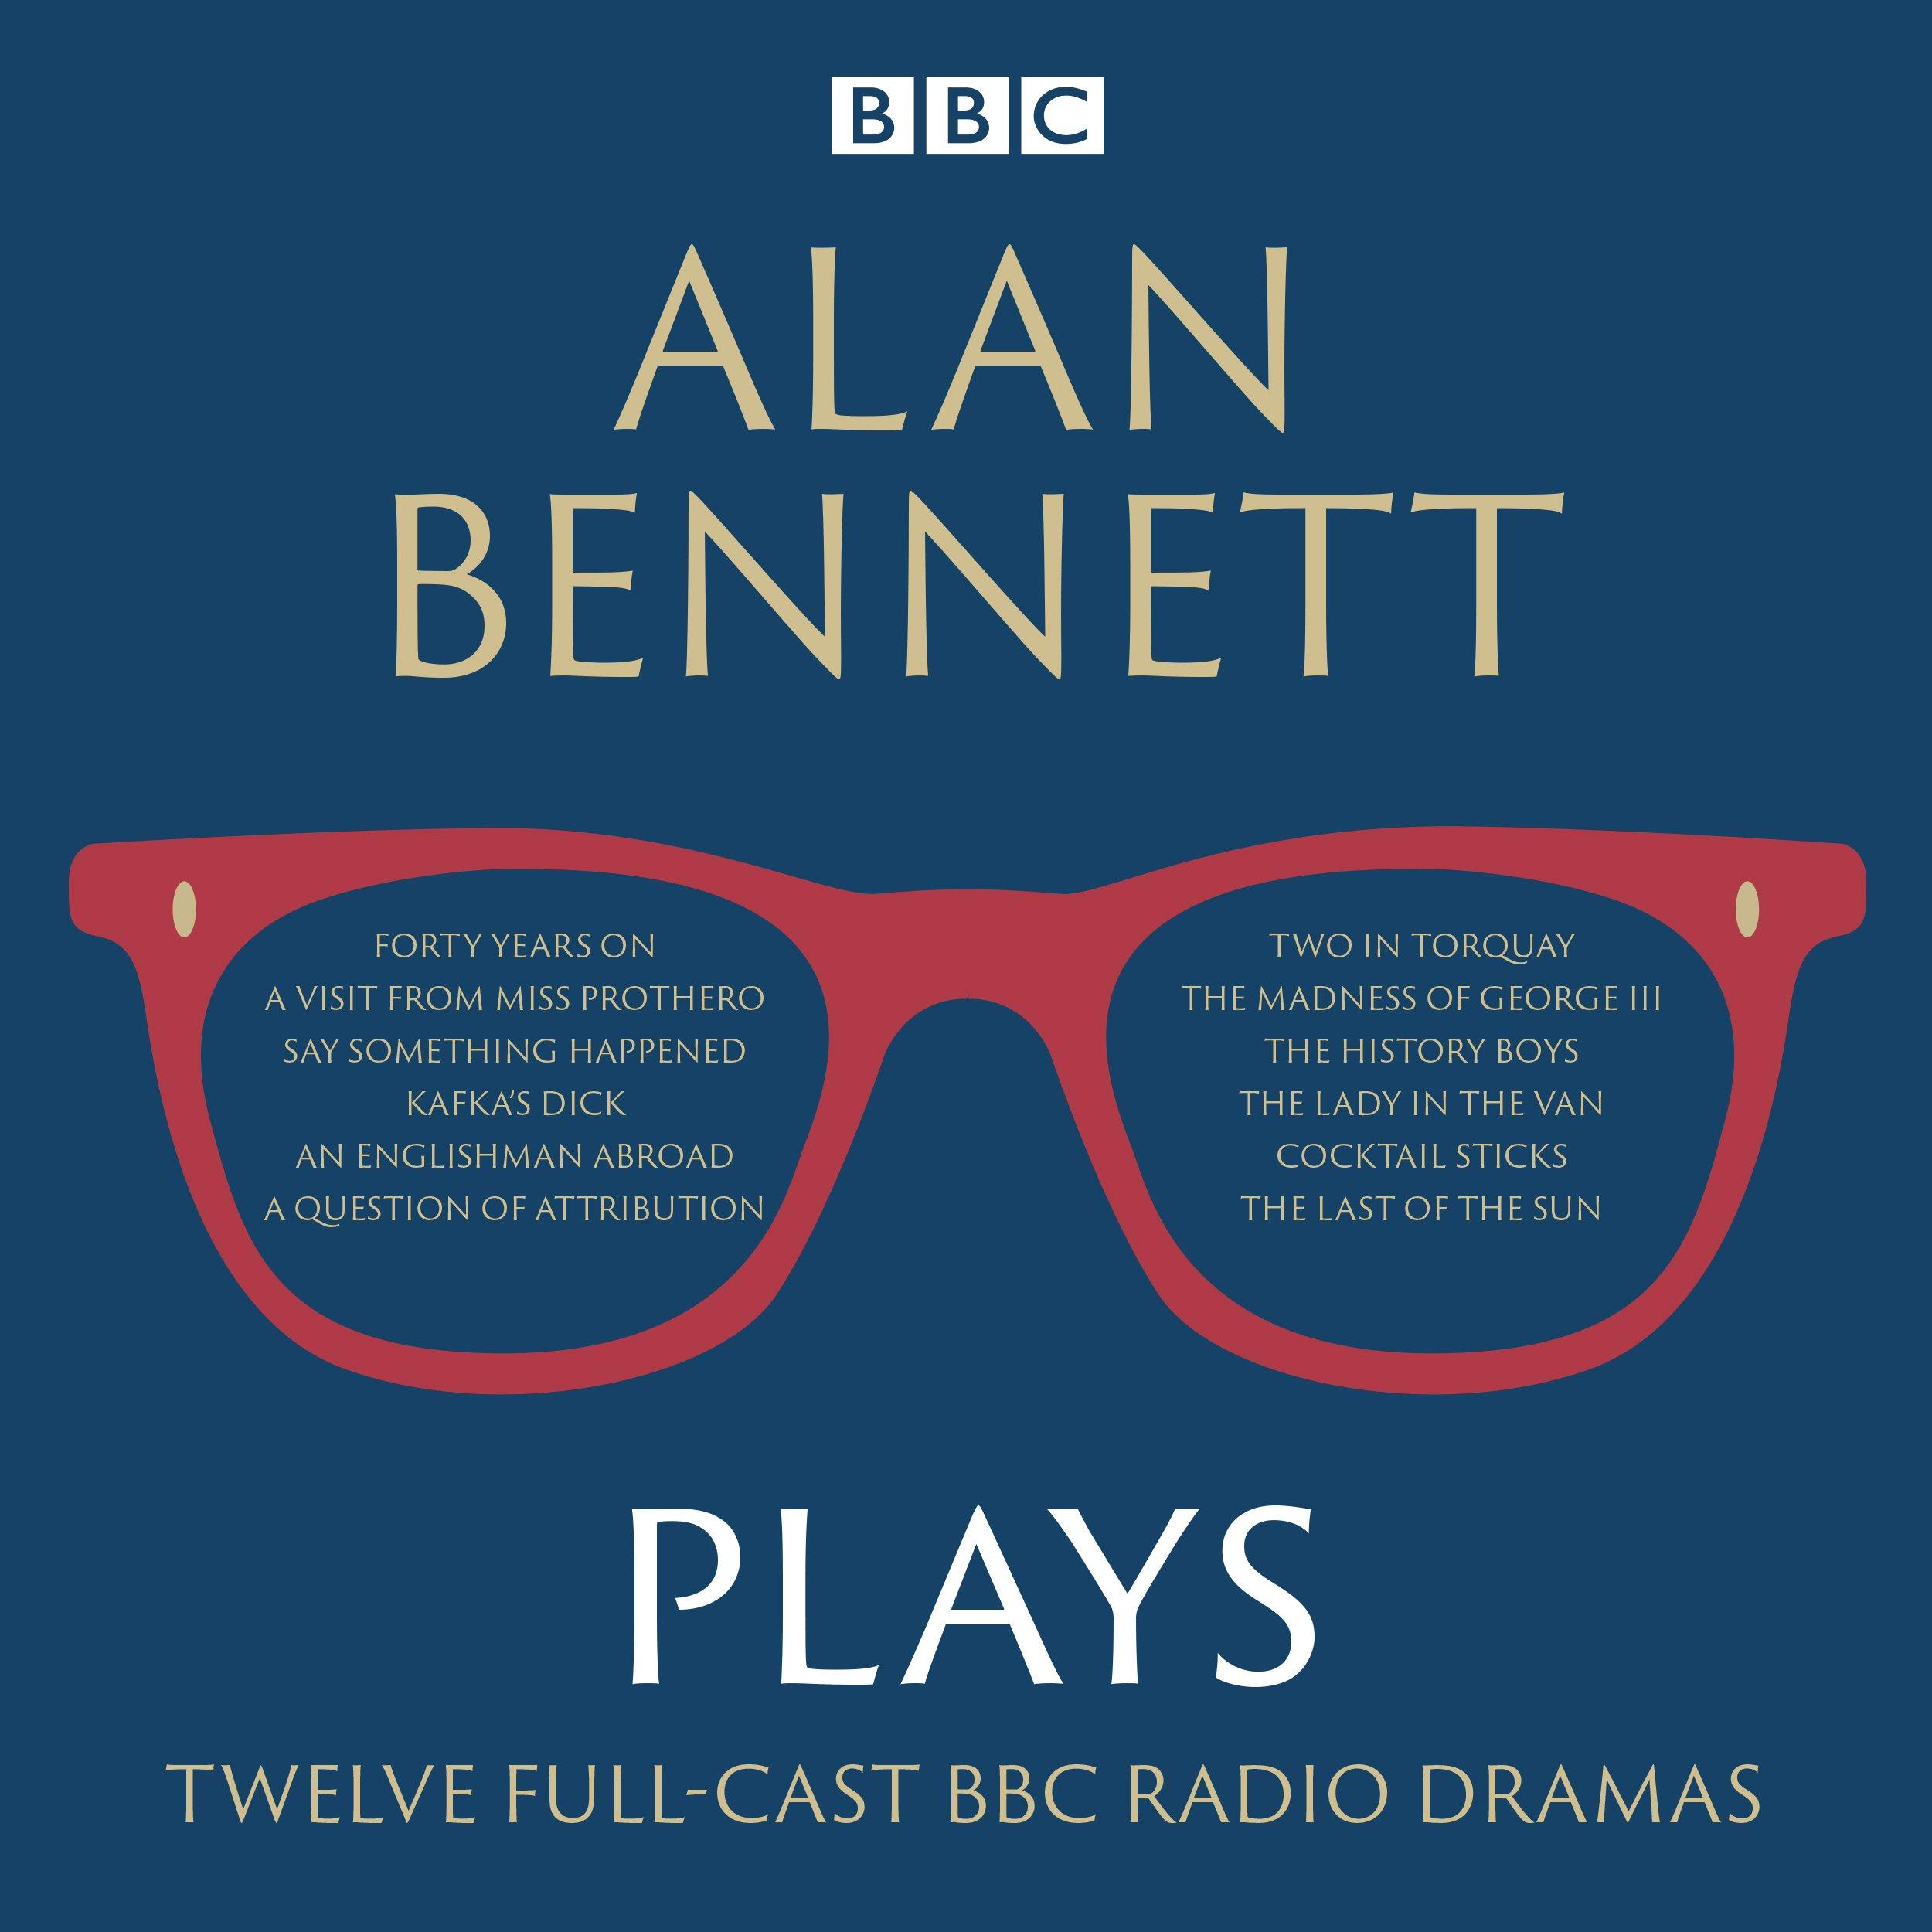 Amazon.com: Alan Bennett: Plays: BBC Radio Dramatisations (9781785293467):  Alan Bennett, Full Cast, John Gielgud, Maggie Smith, Patricia Routledge:  Books